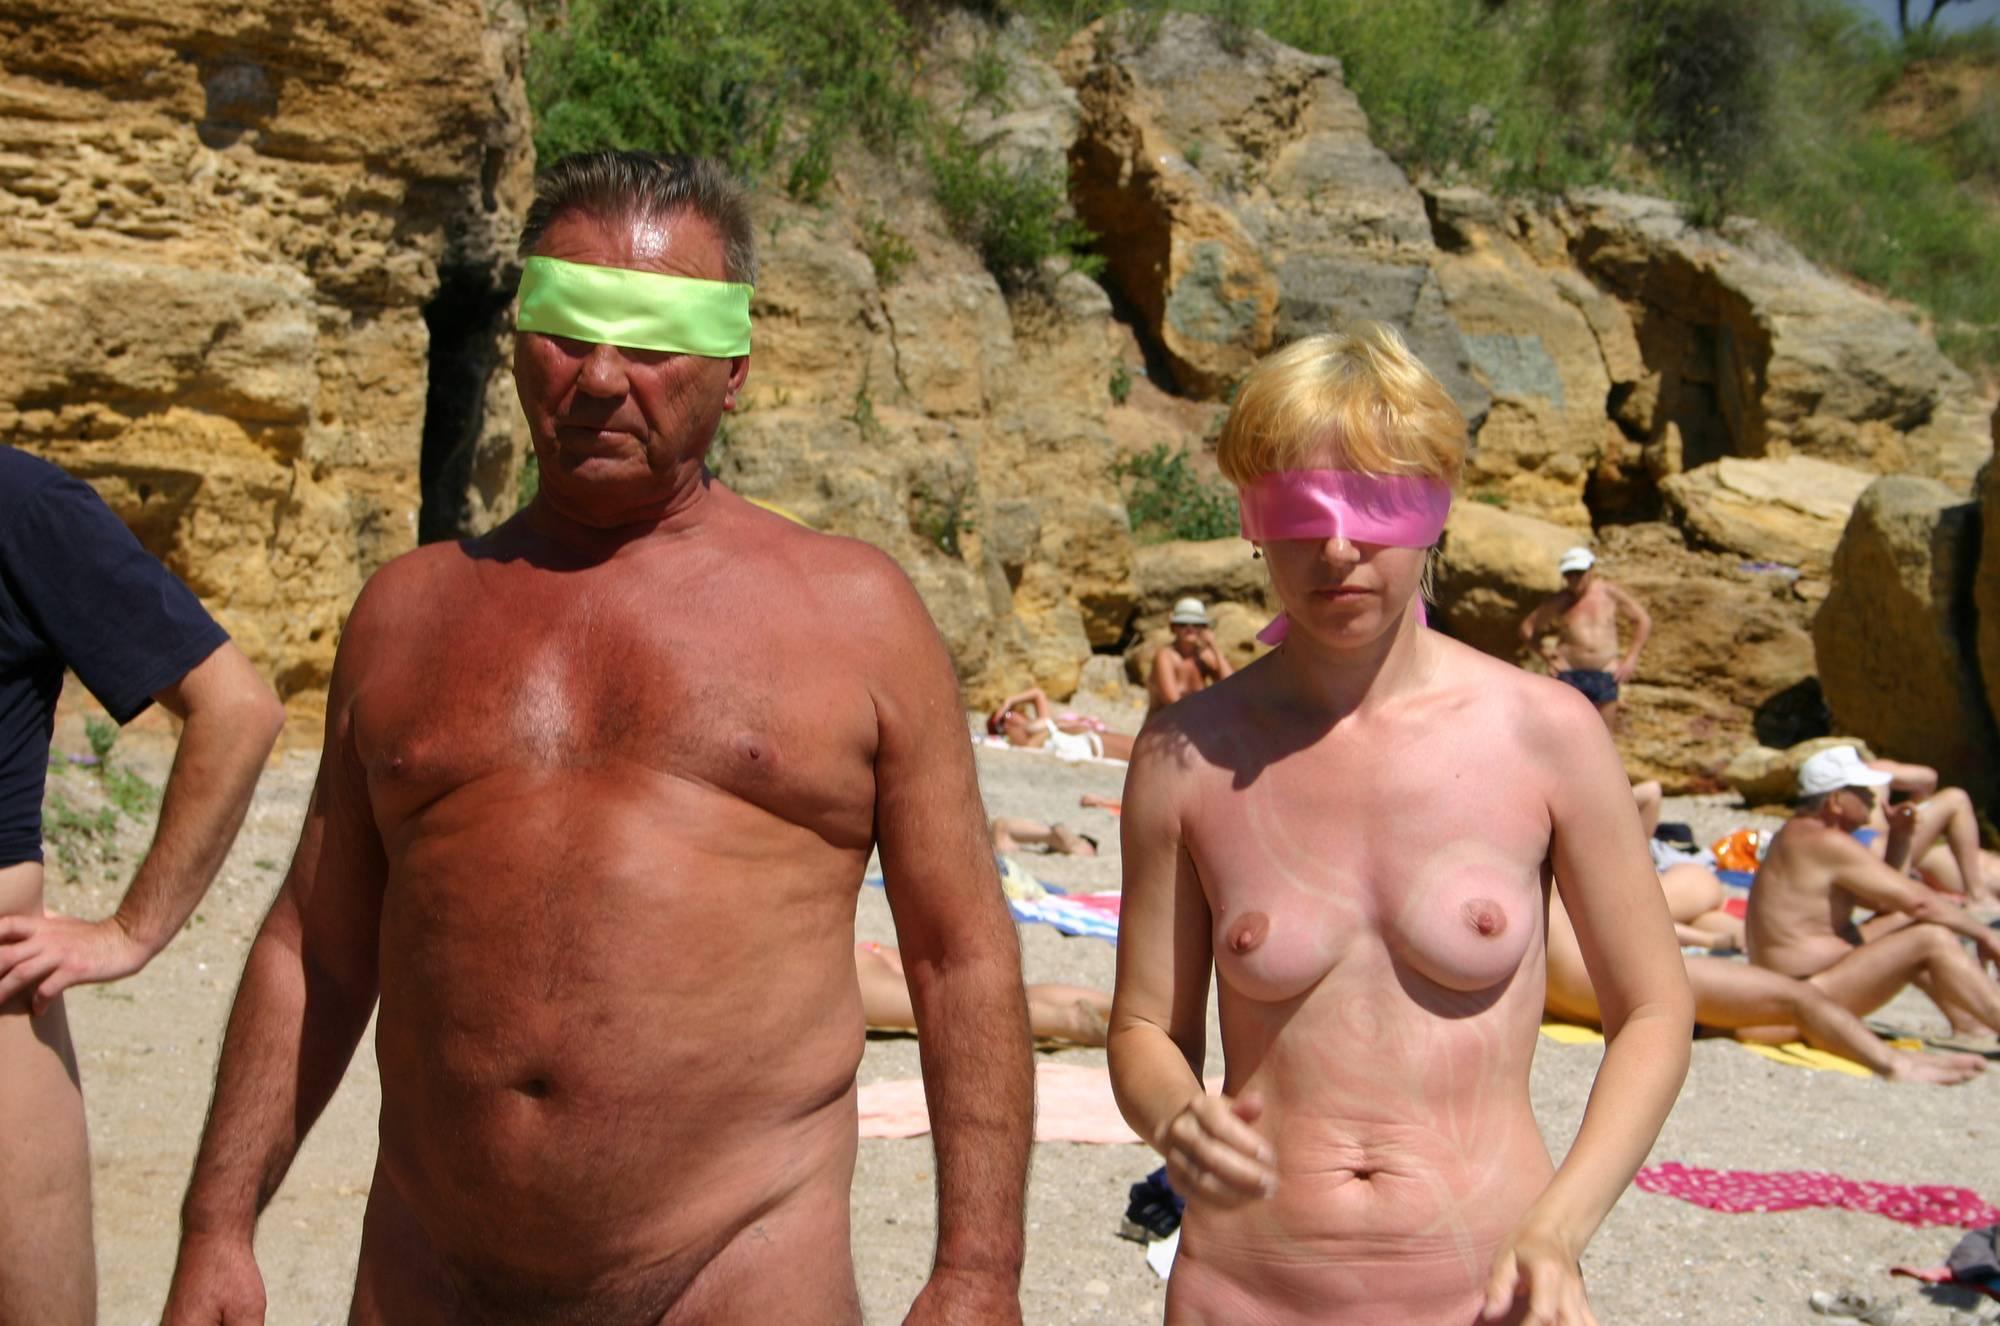 Nudist Pics Nude Family Beach Games - 1